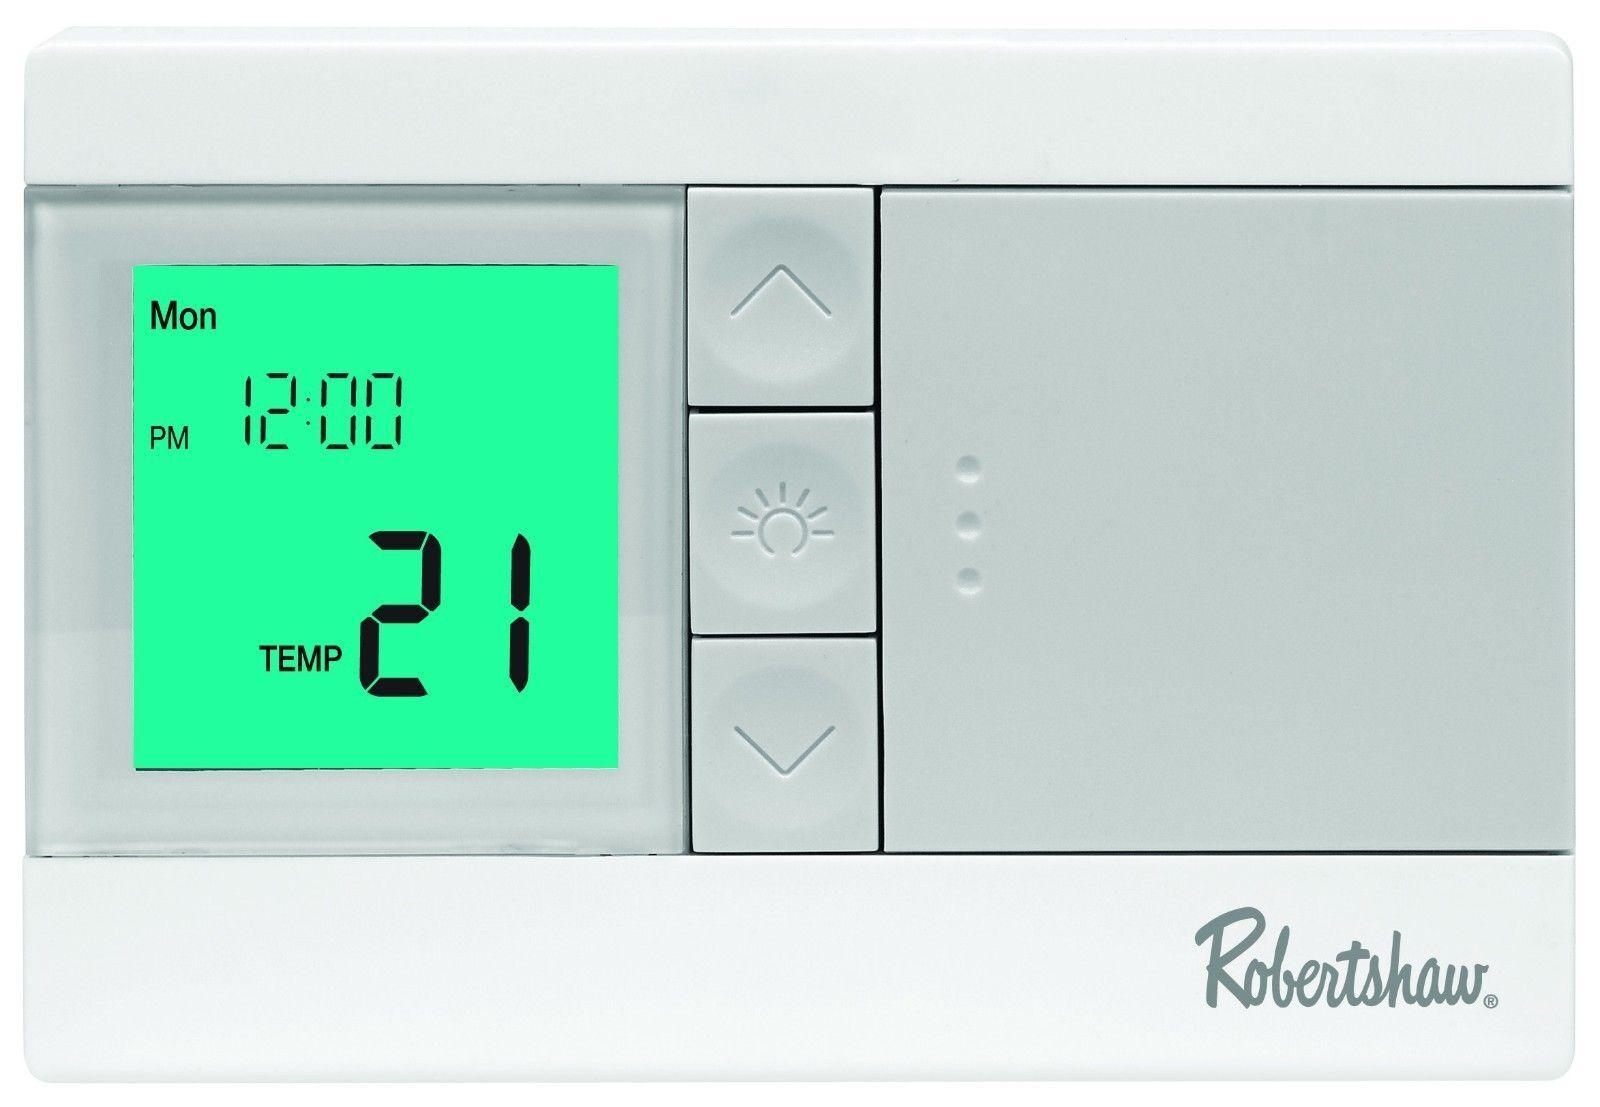 Ziemlich 6 Draht Thermostat Ideen - Verdrahtungsideen - korsmi.info